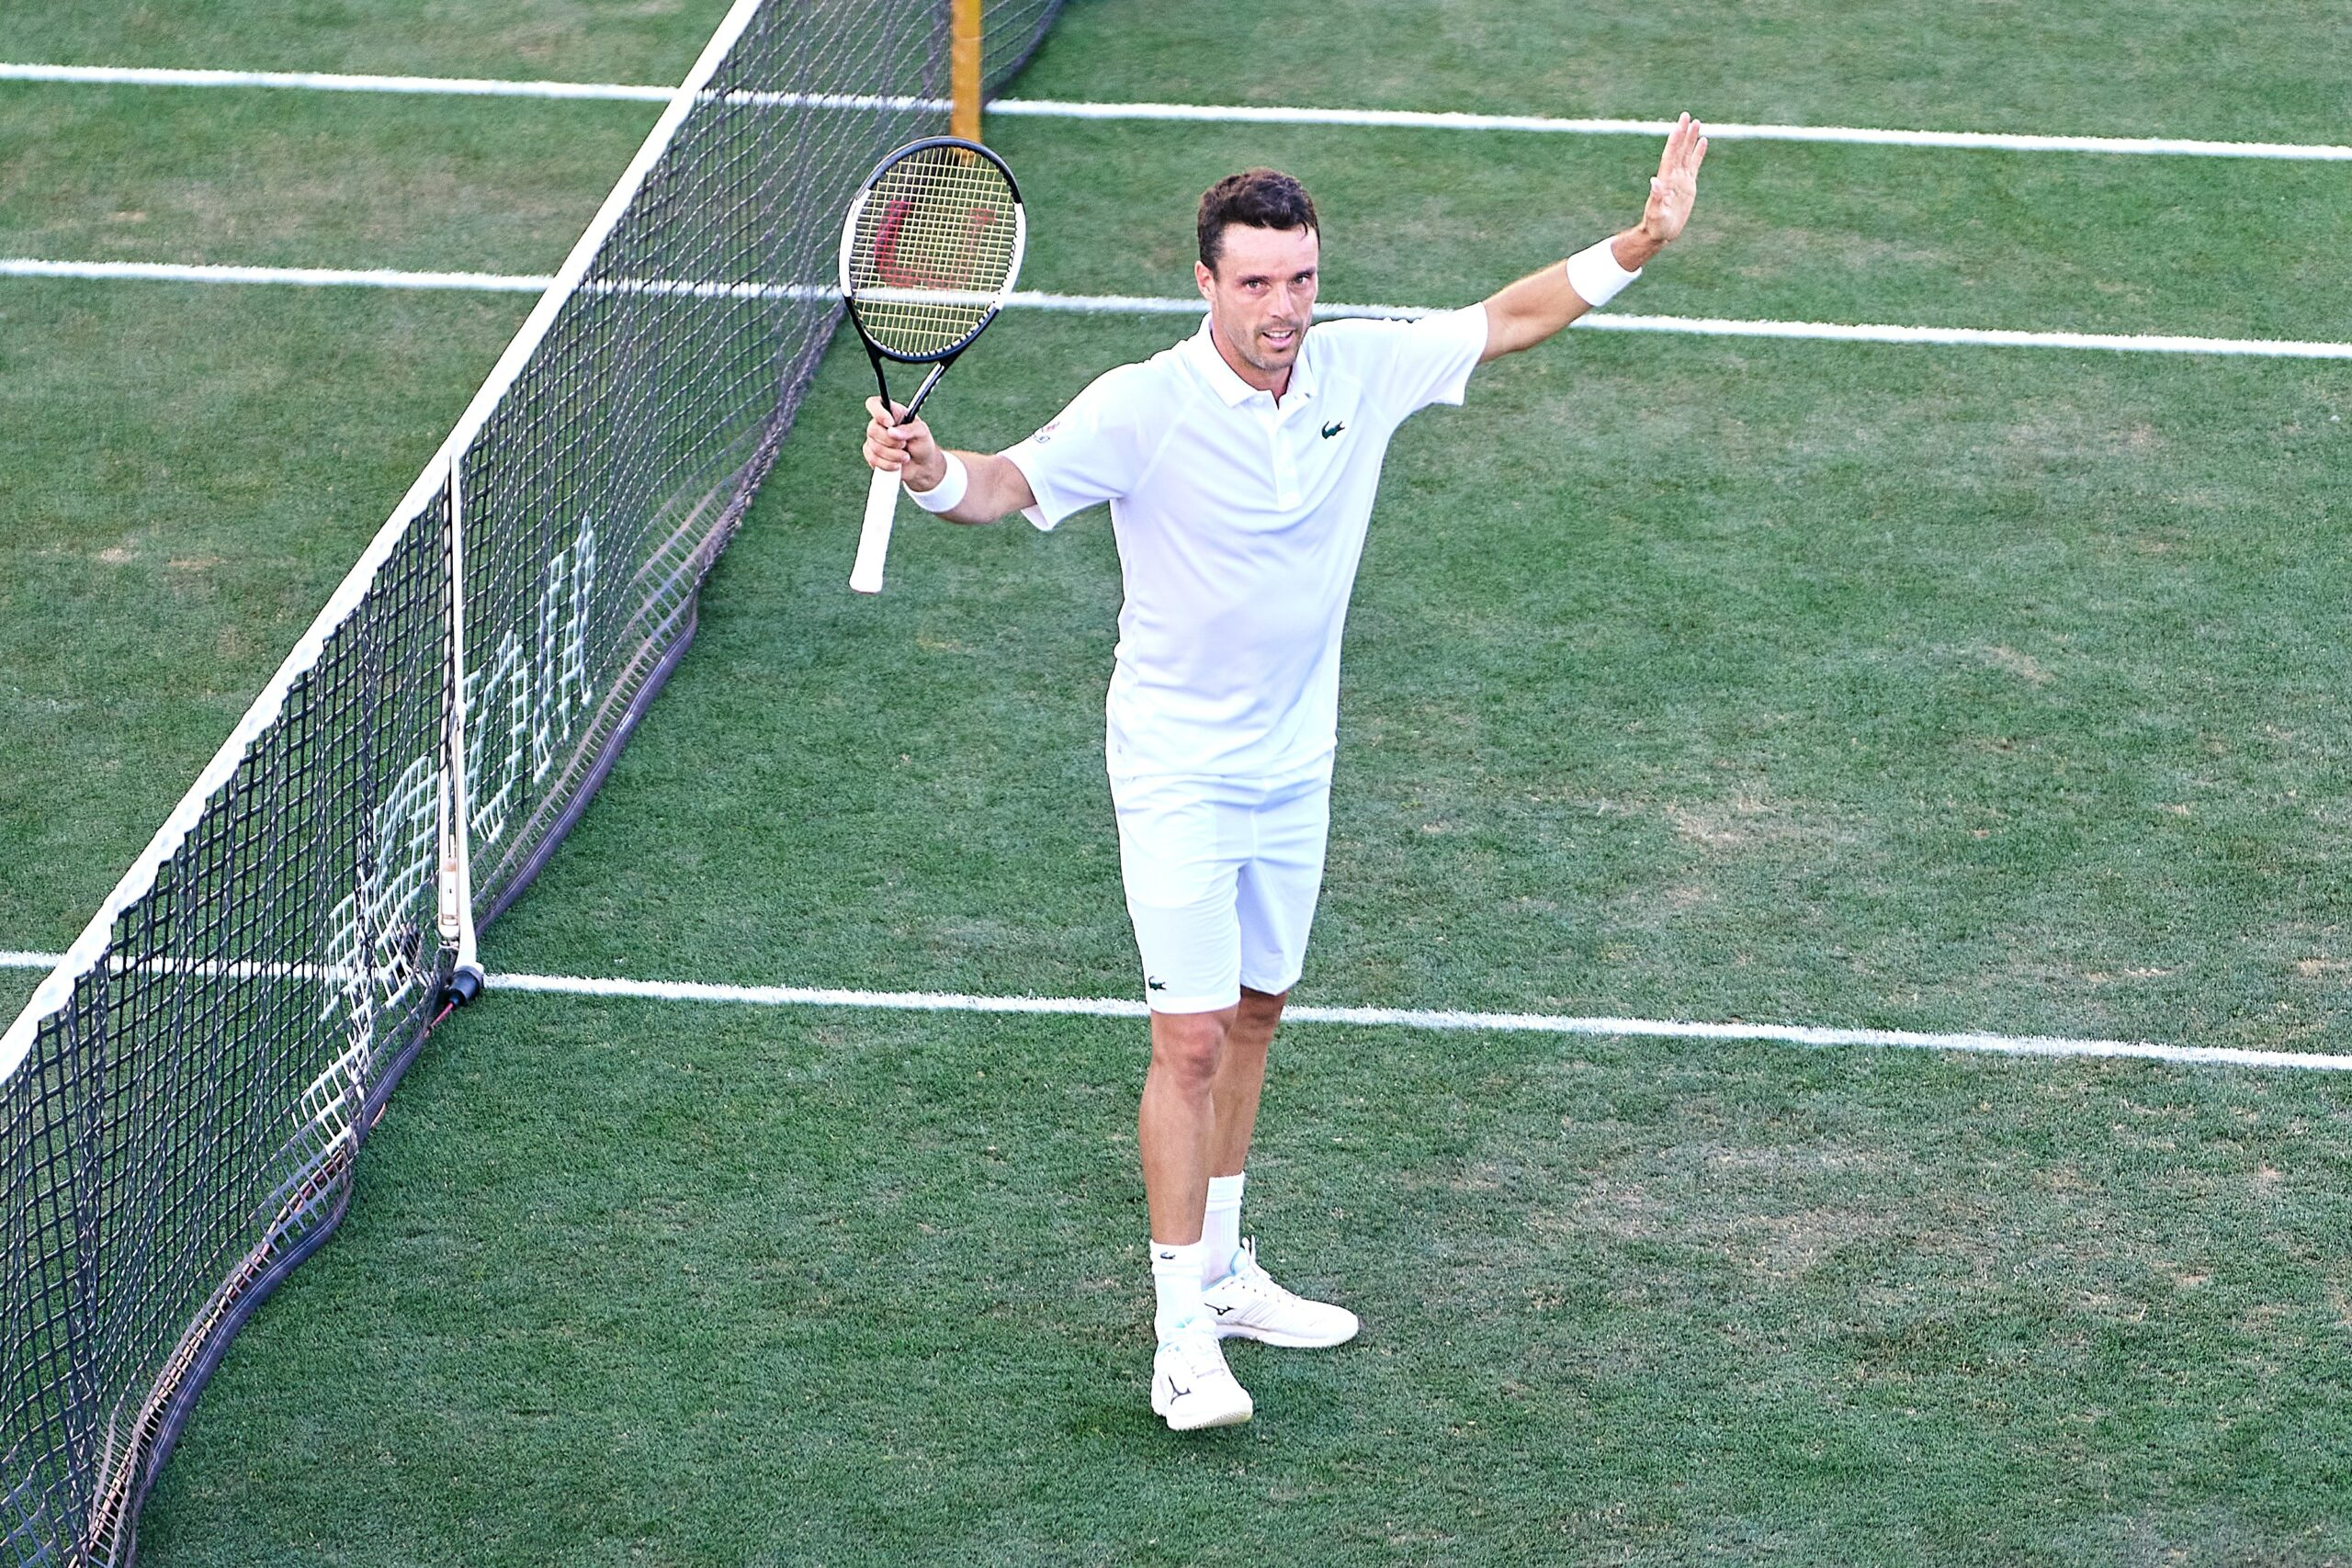 Wimbledon Championships 2021: Roberto Bautista Agut vs. Dominik Koepfer Tennis Pick and Prediction